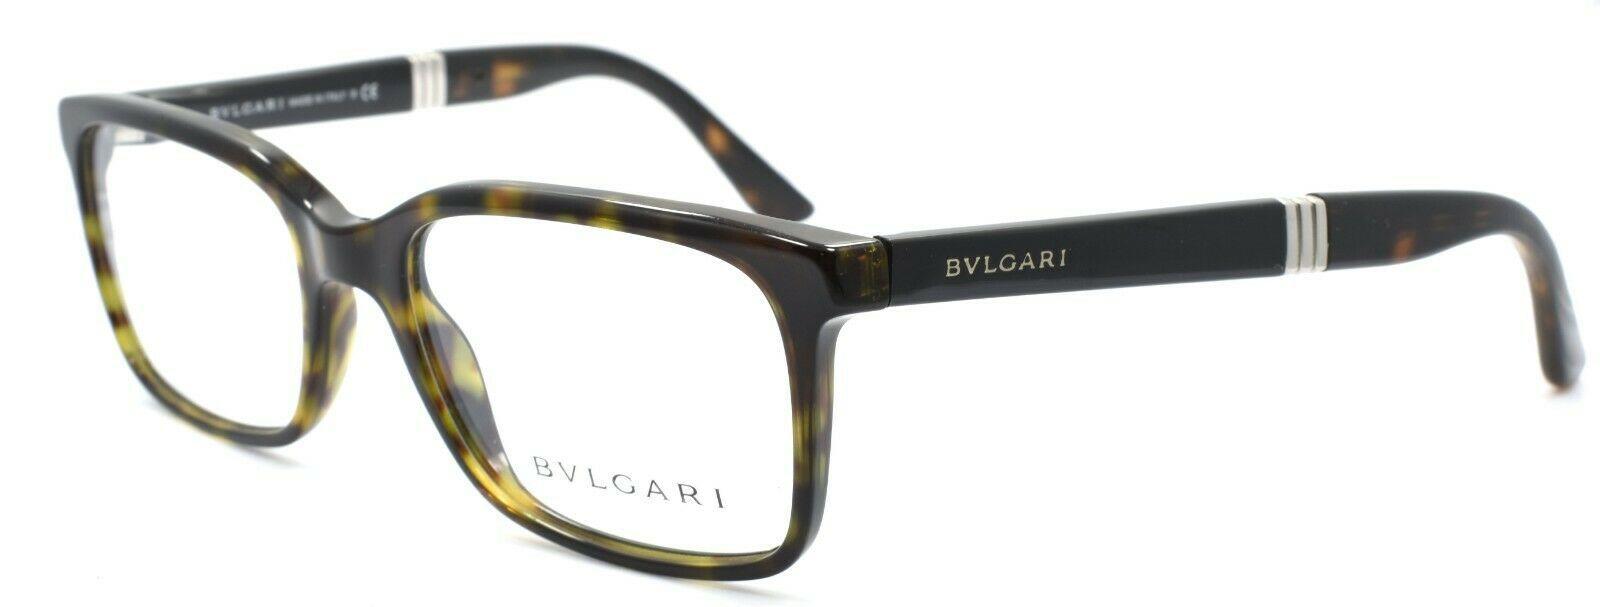 BVLGARI 3018 504 Eyeglasses Frames 52-18-140 Dark Havana ITALY - $118.60